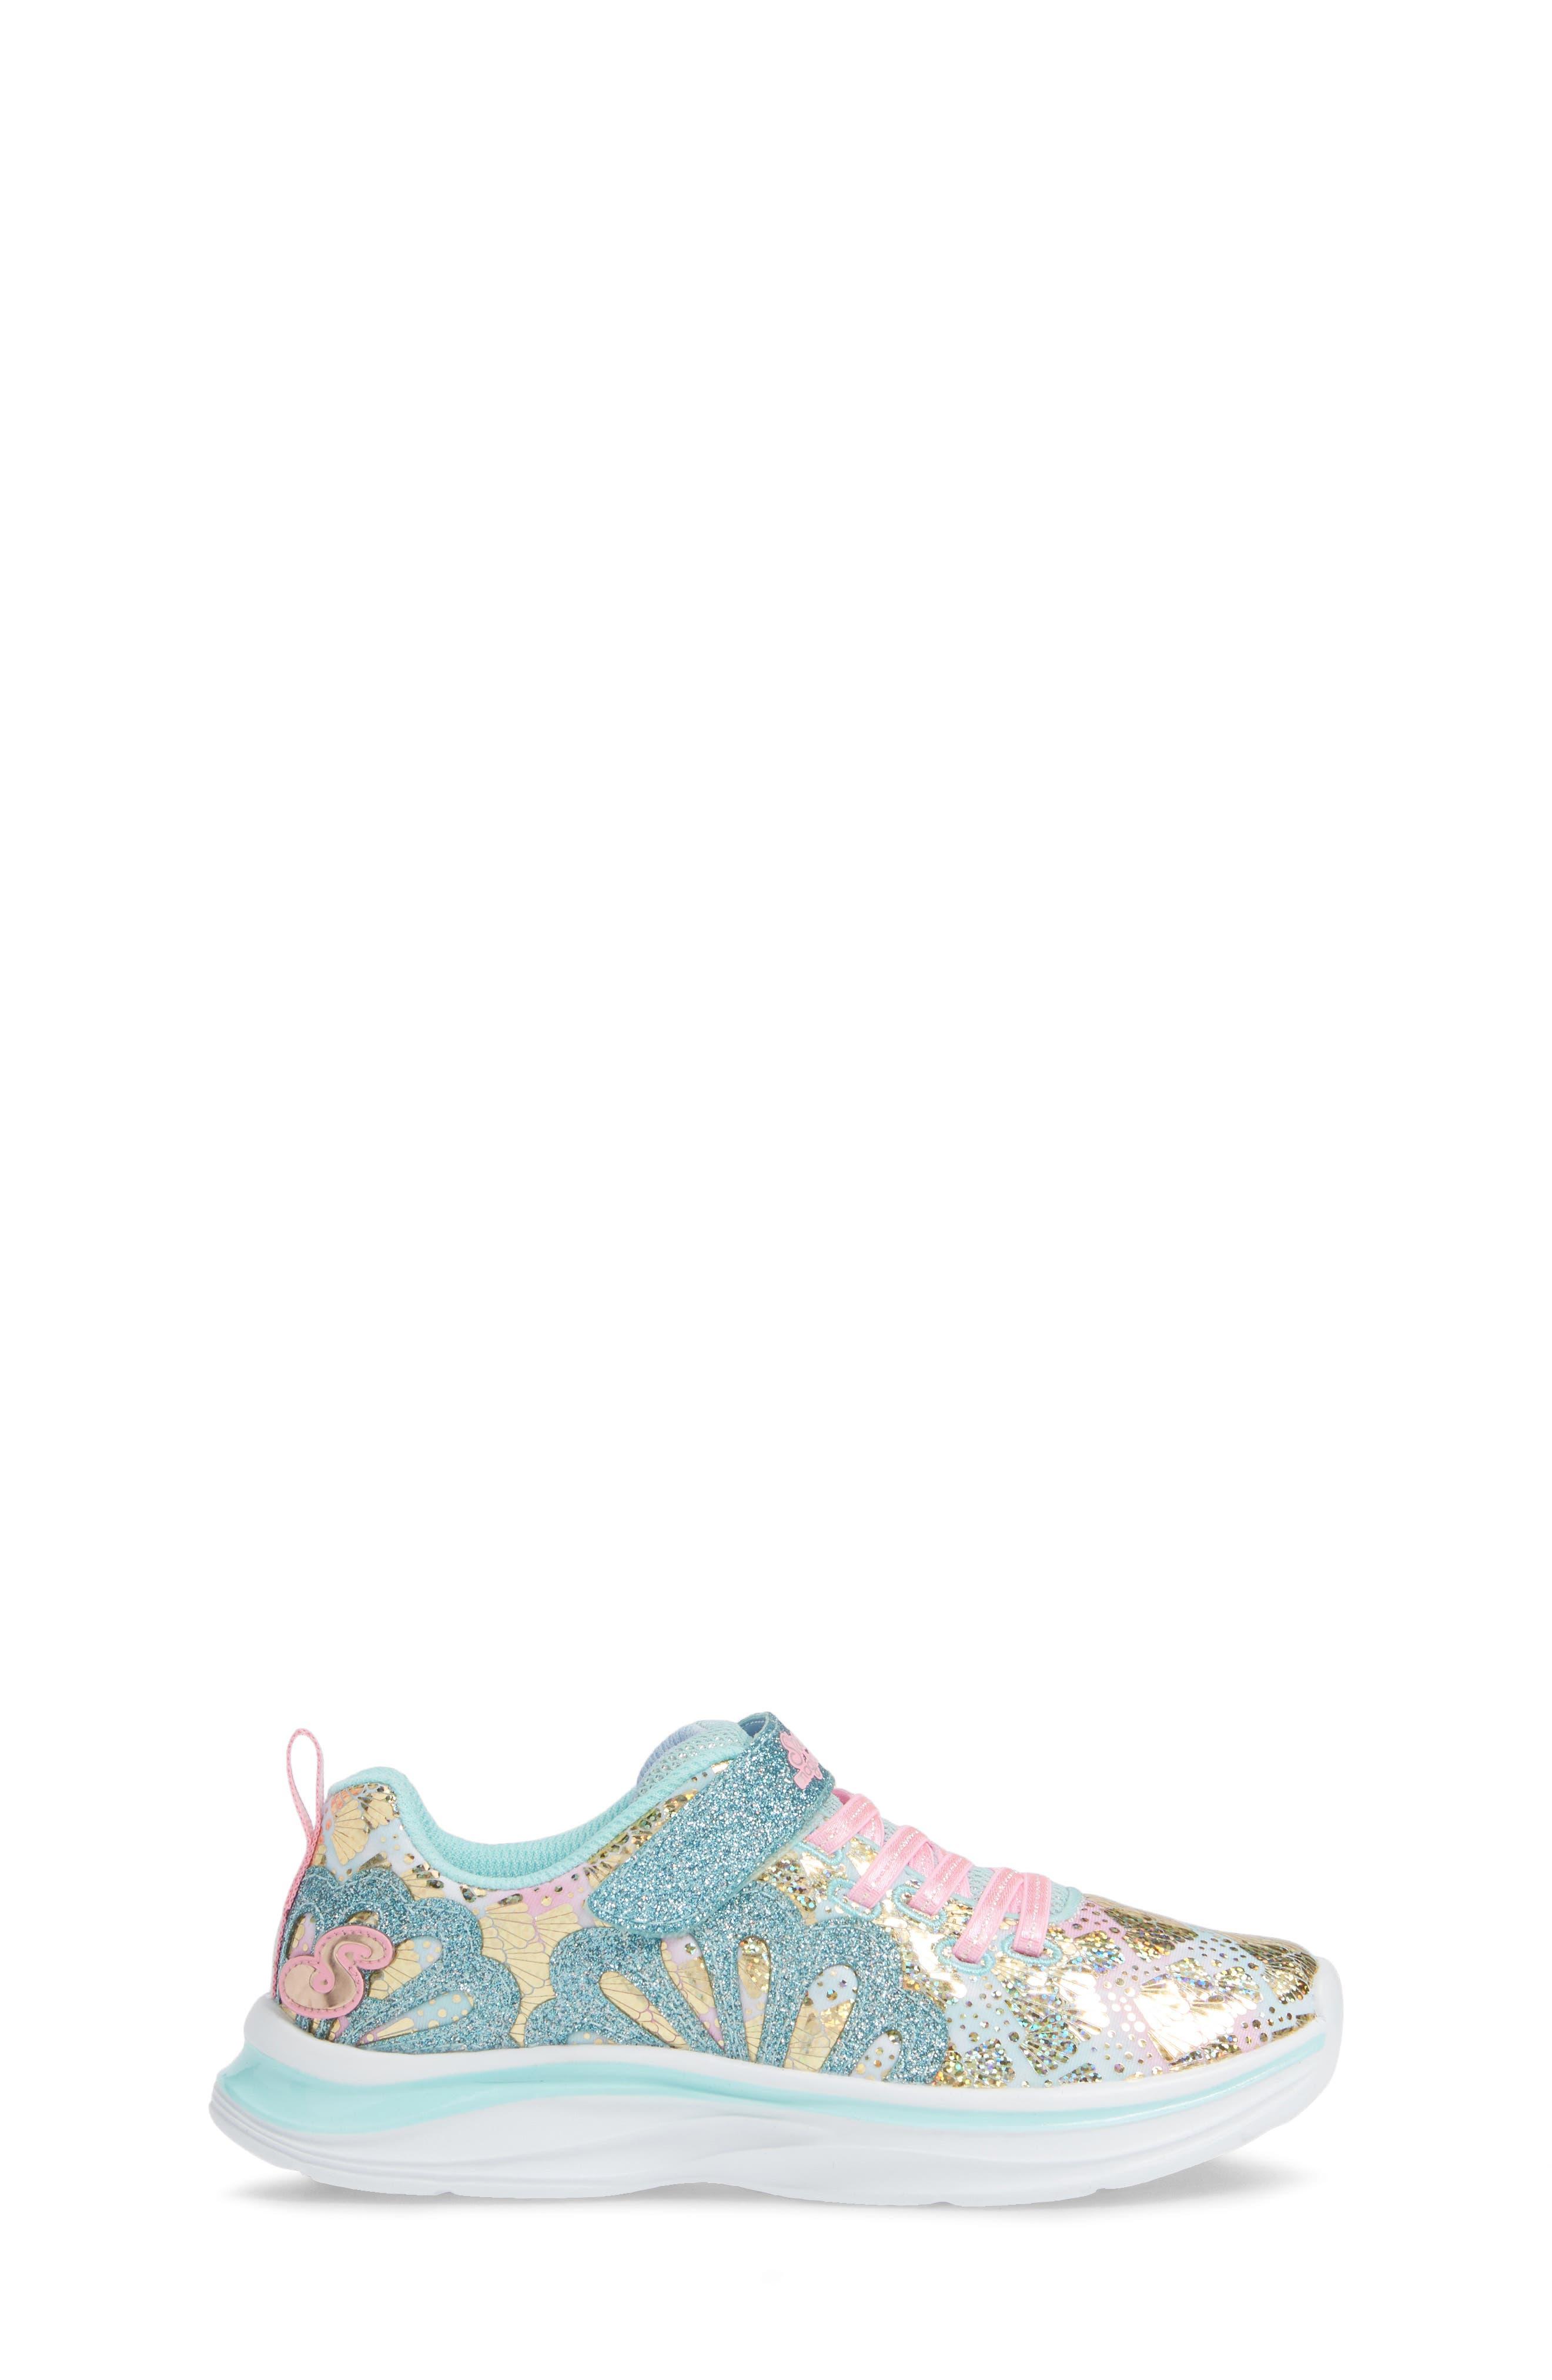 SKECHERS, Double Dreams Shimmer Sneaker, Alternate thumbnail 3, color, AQUA/ PINK TEXTILE